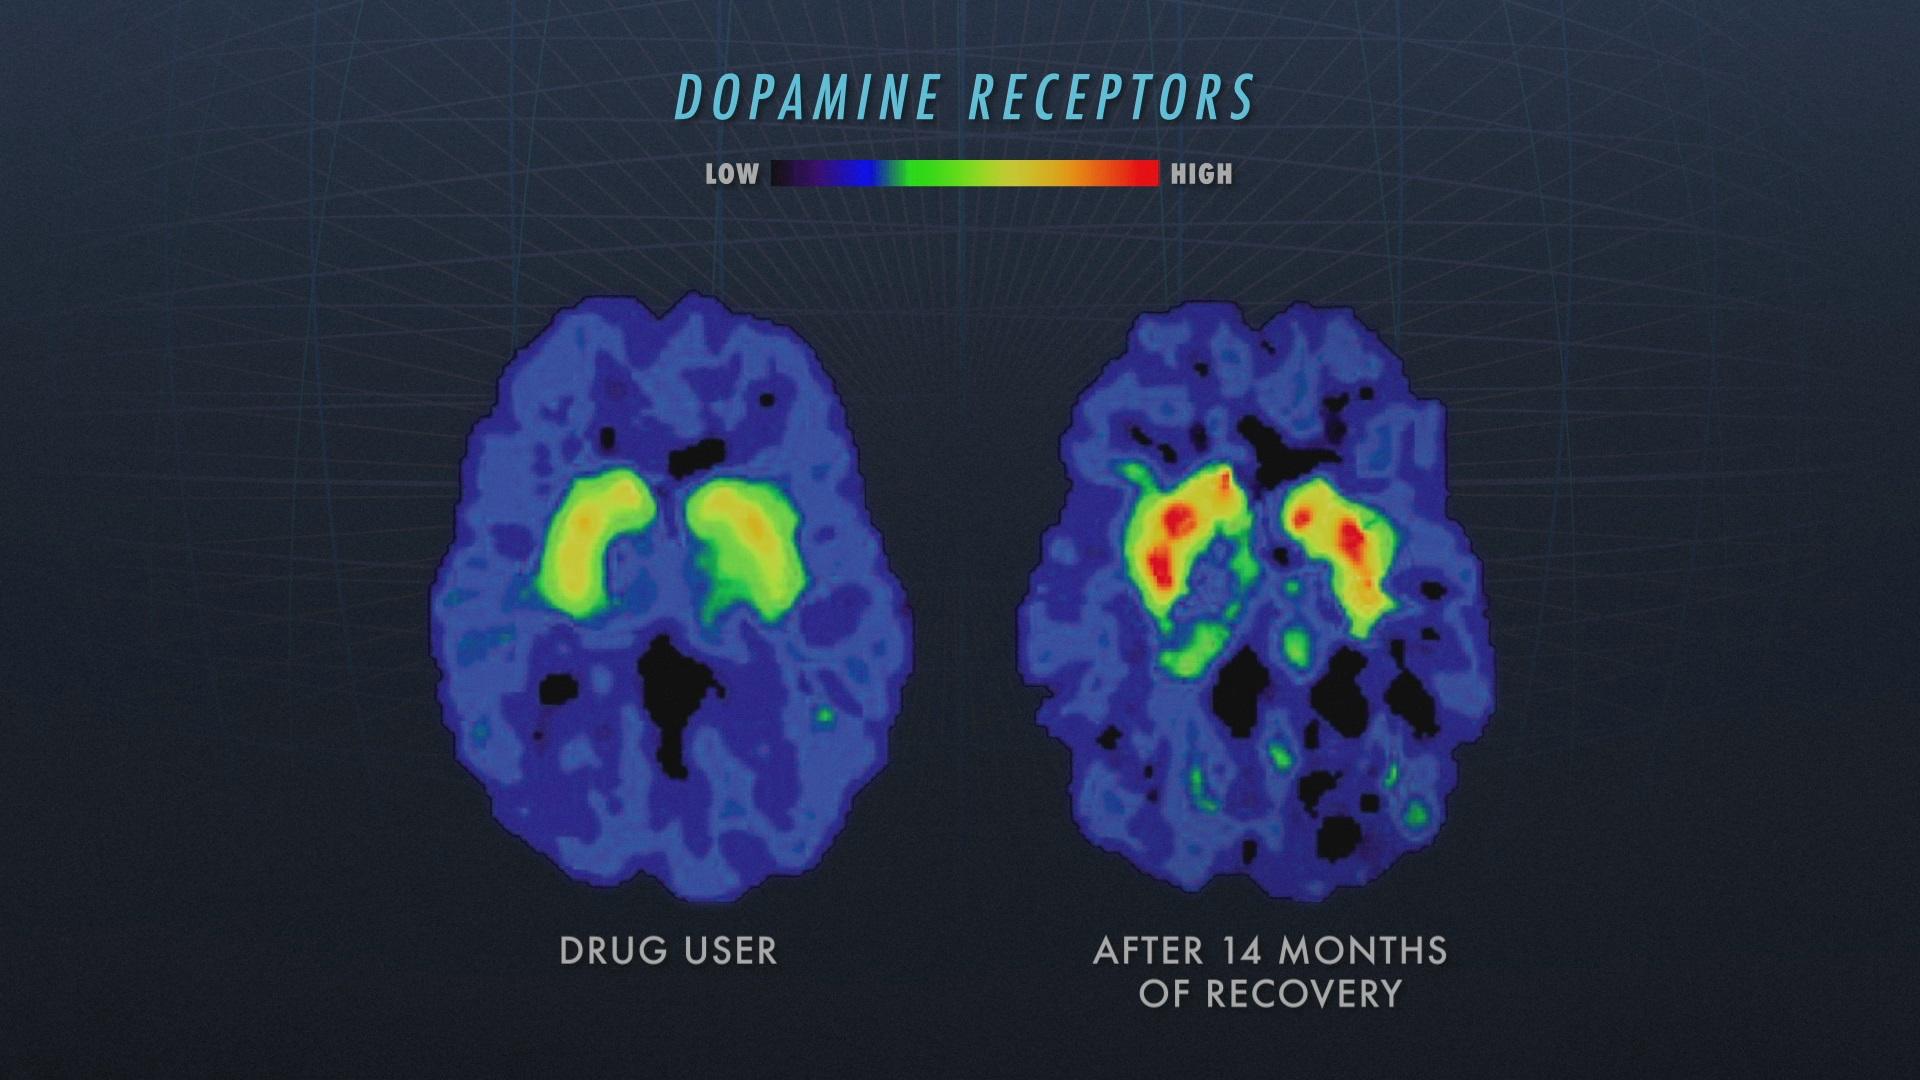 Brain scans, Nova